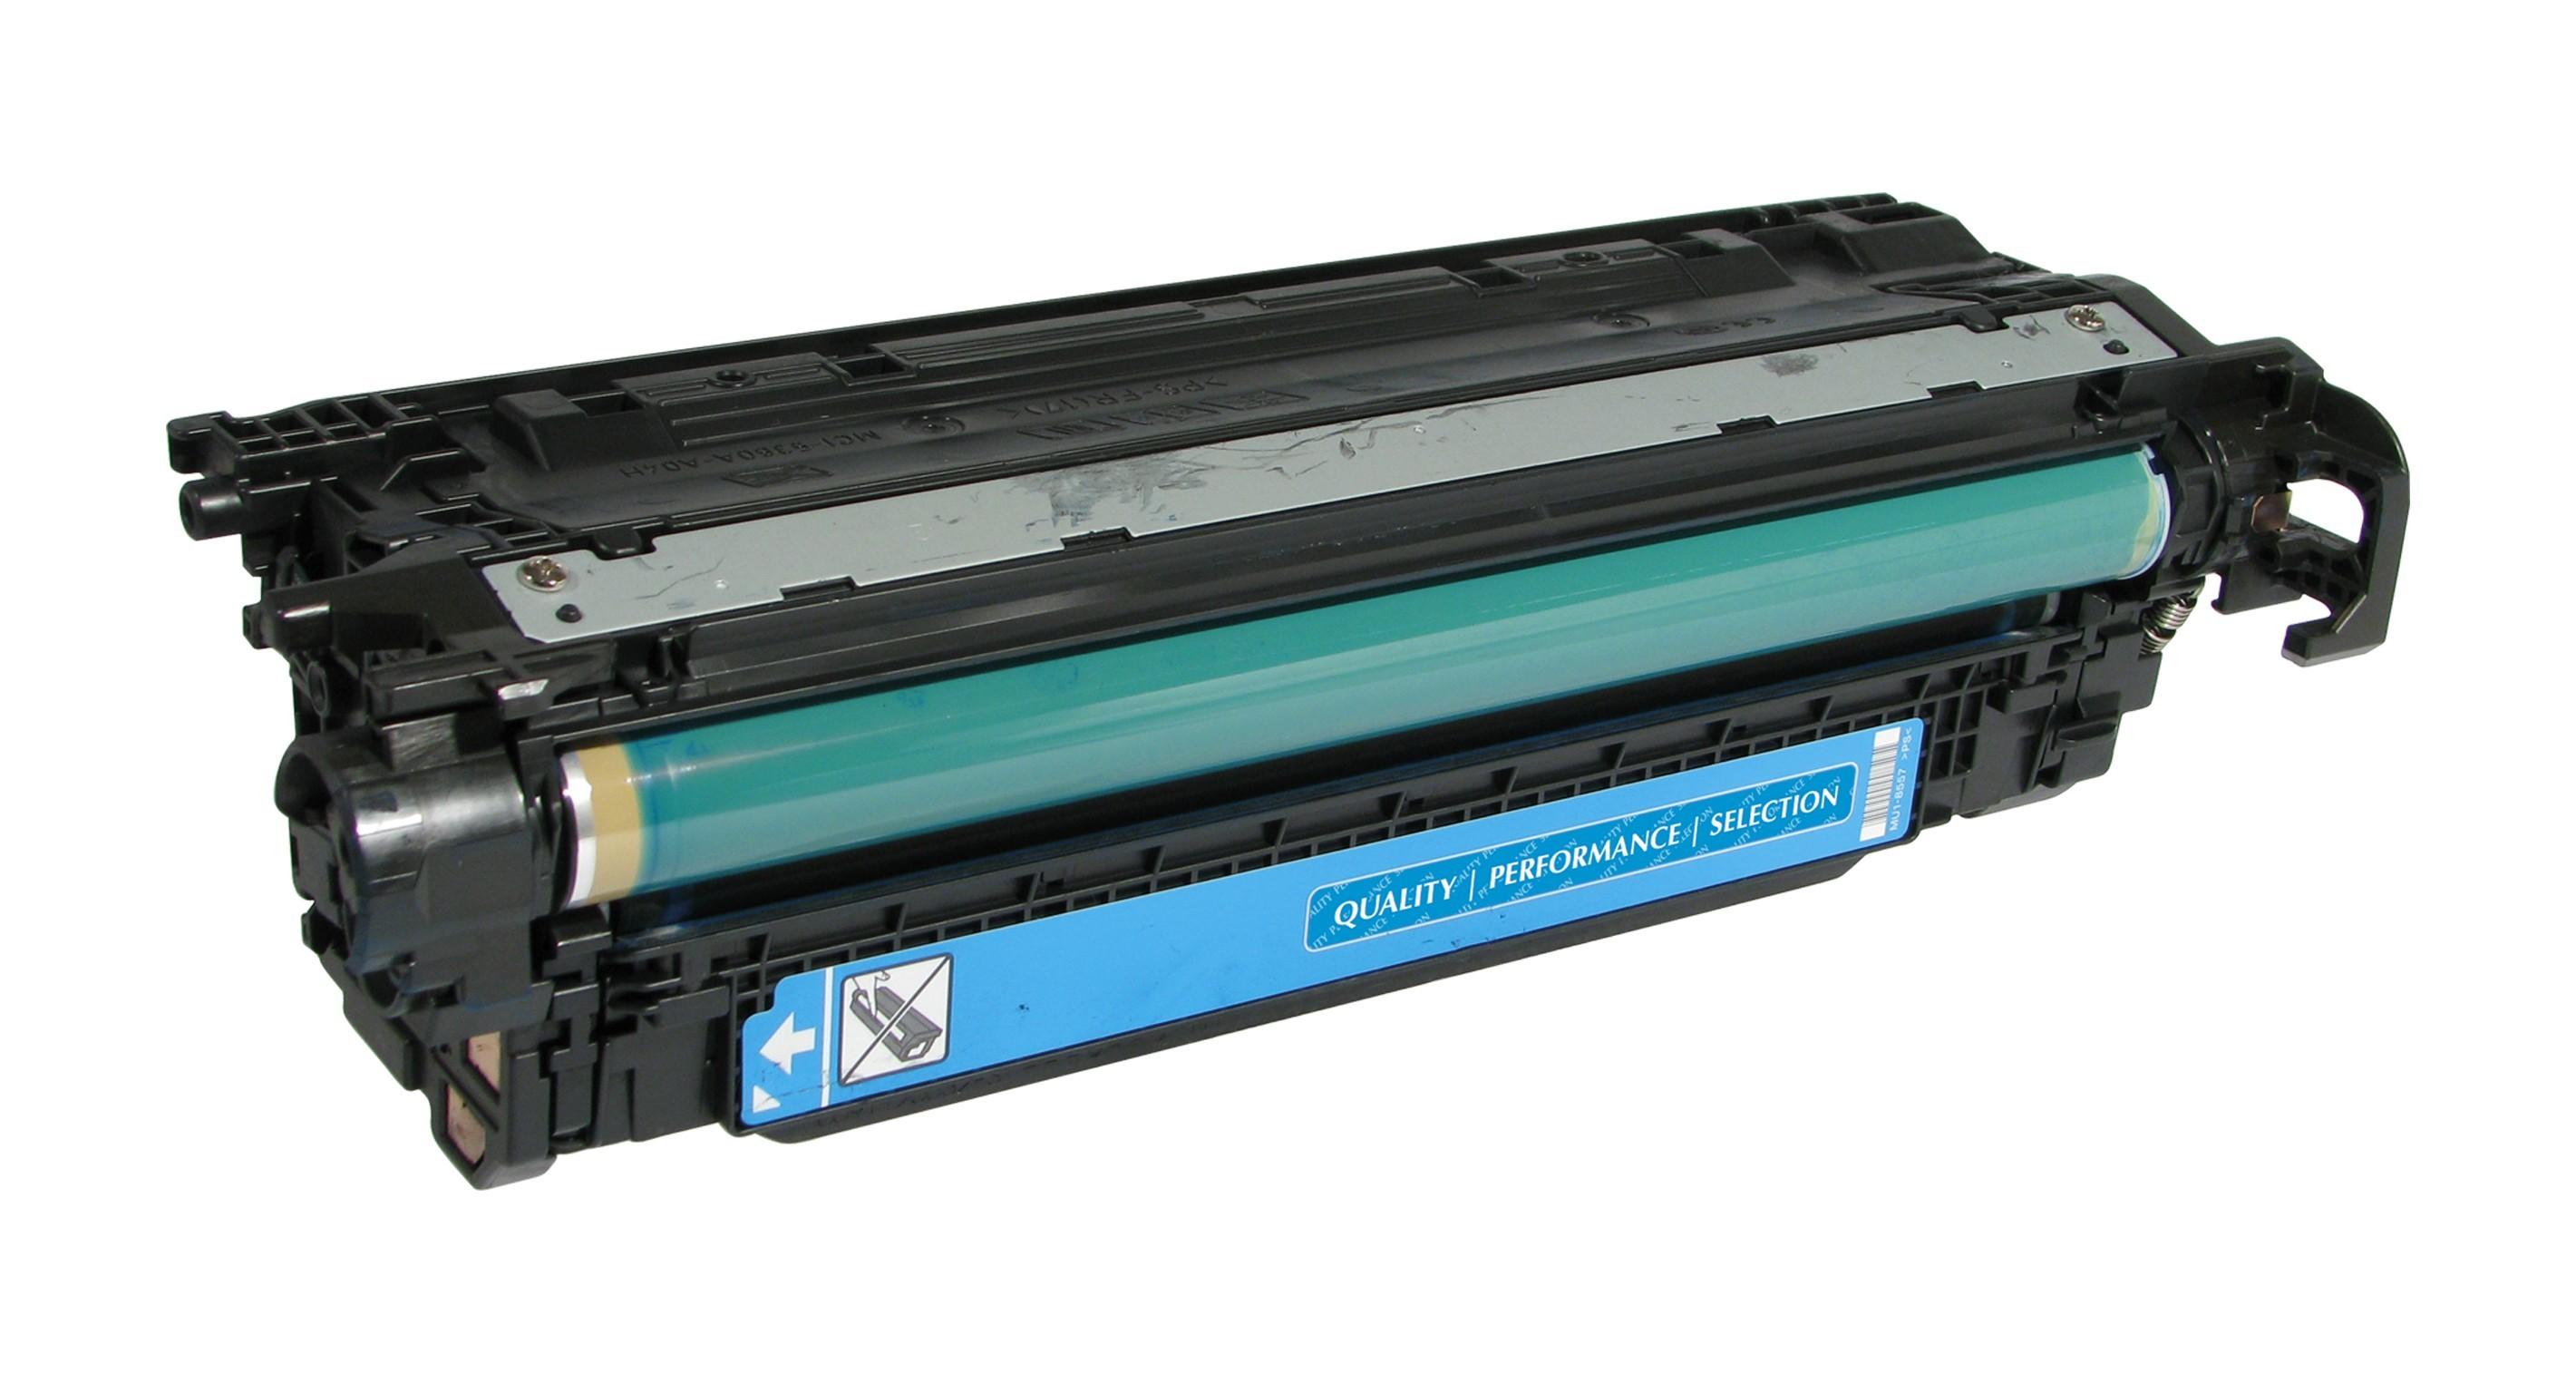 Cartus Toner 504a Compatibil Hp Remanufacturat Culoare: Cyan